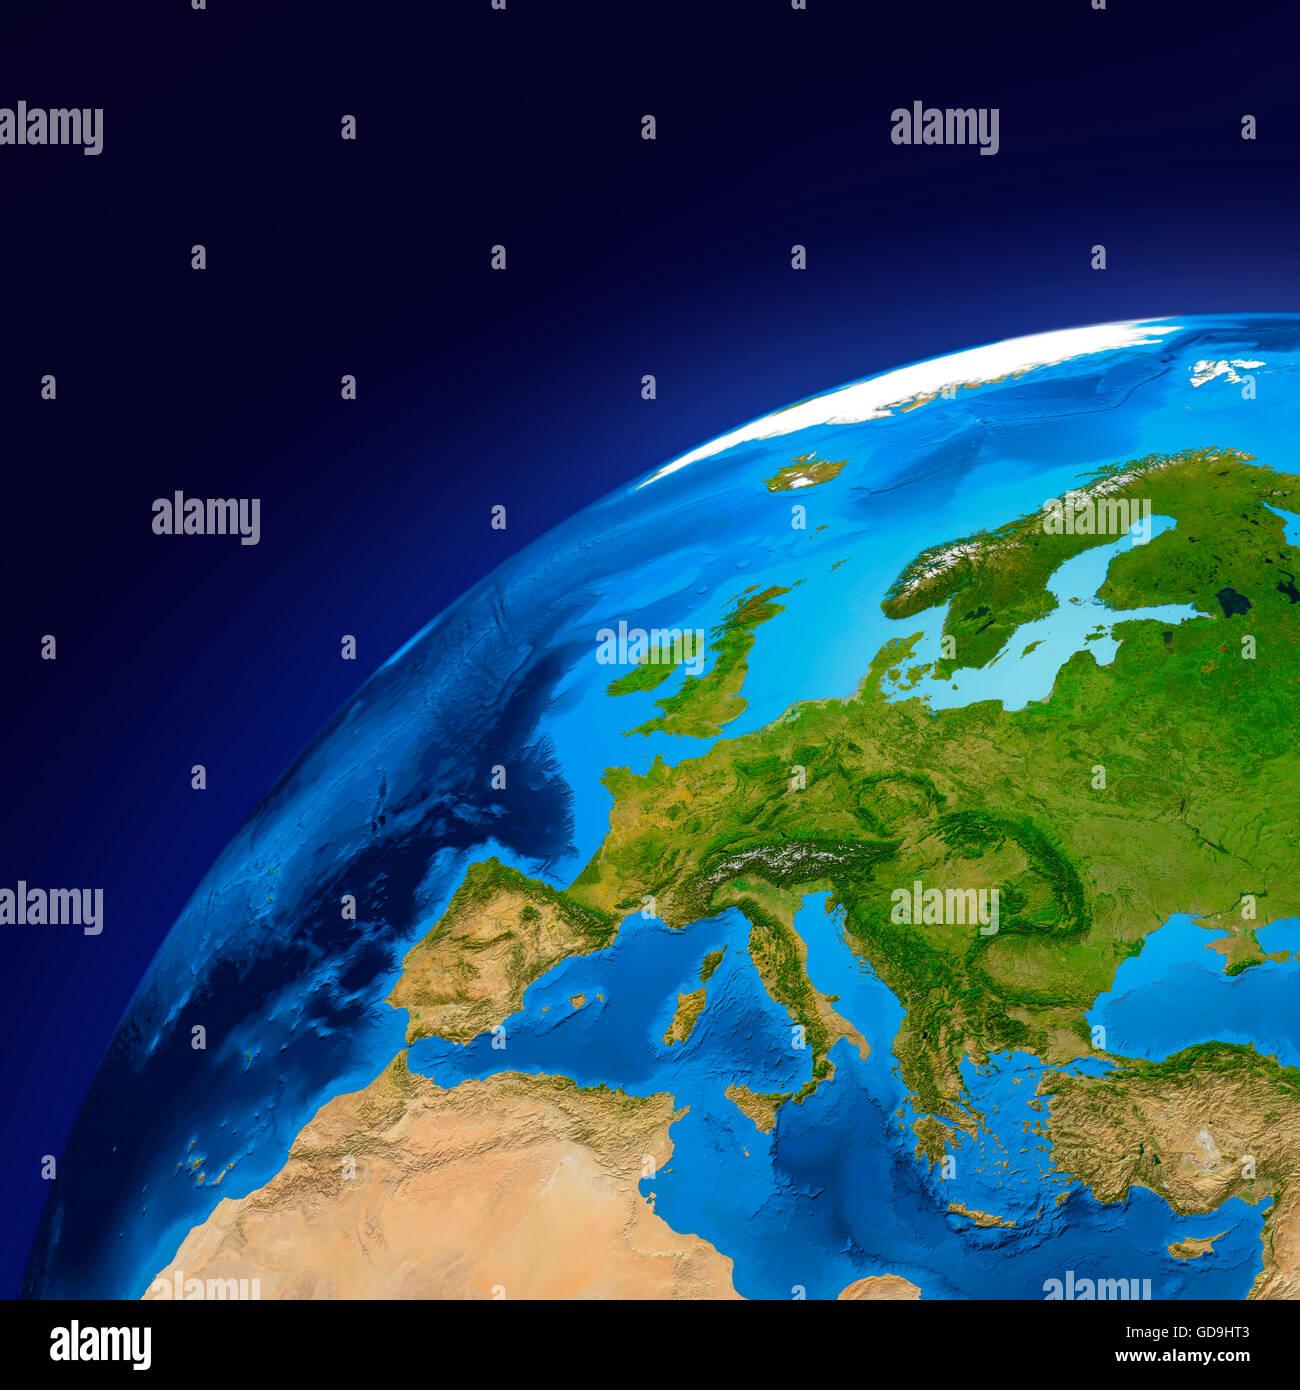 Erdkugel zeigt europäische Kontinent, 3D illustration Stockbild